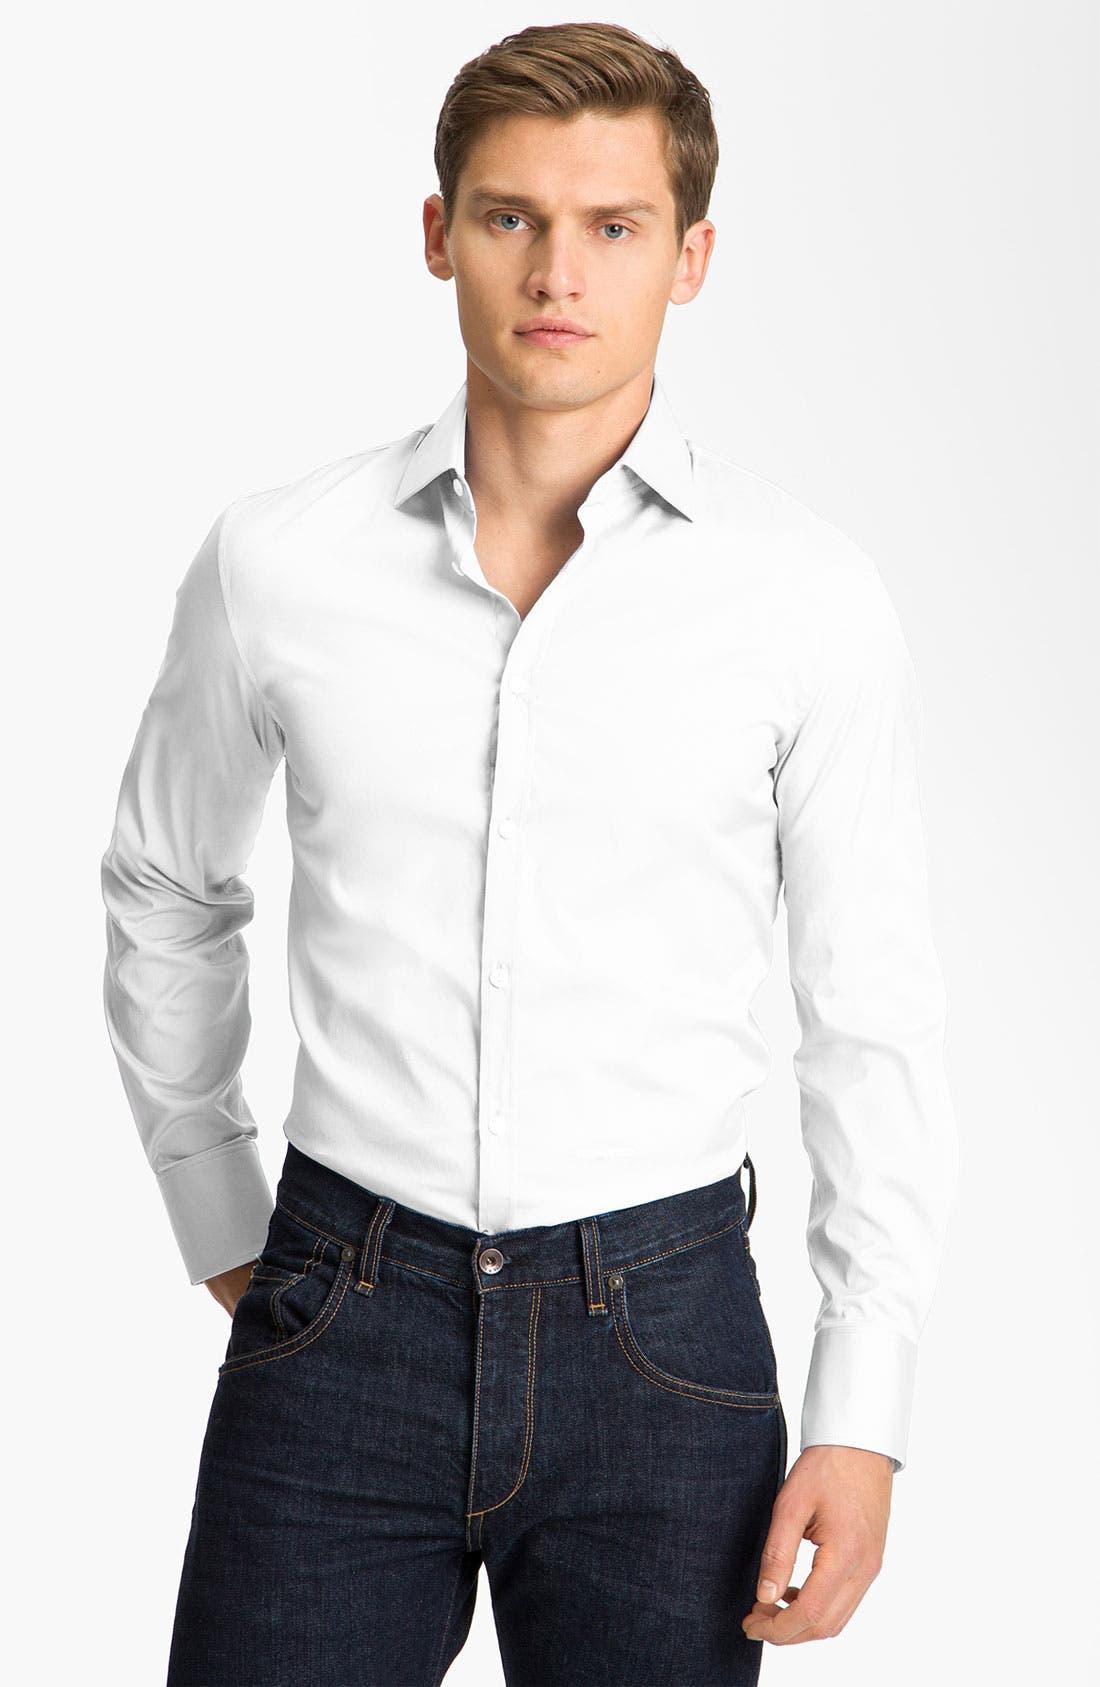 Main Image - Dsquared2 'Dean Dan' Stretch Cotton Dress Shirt